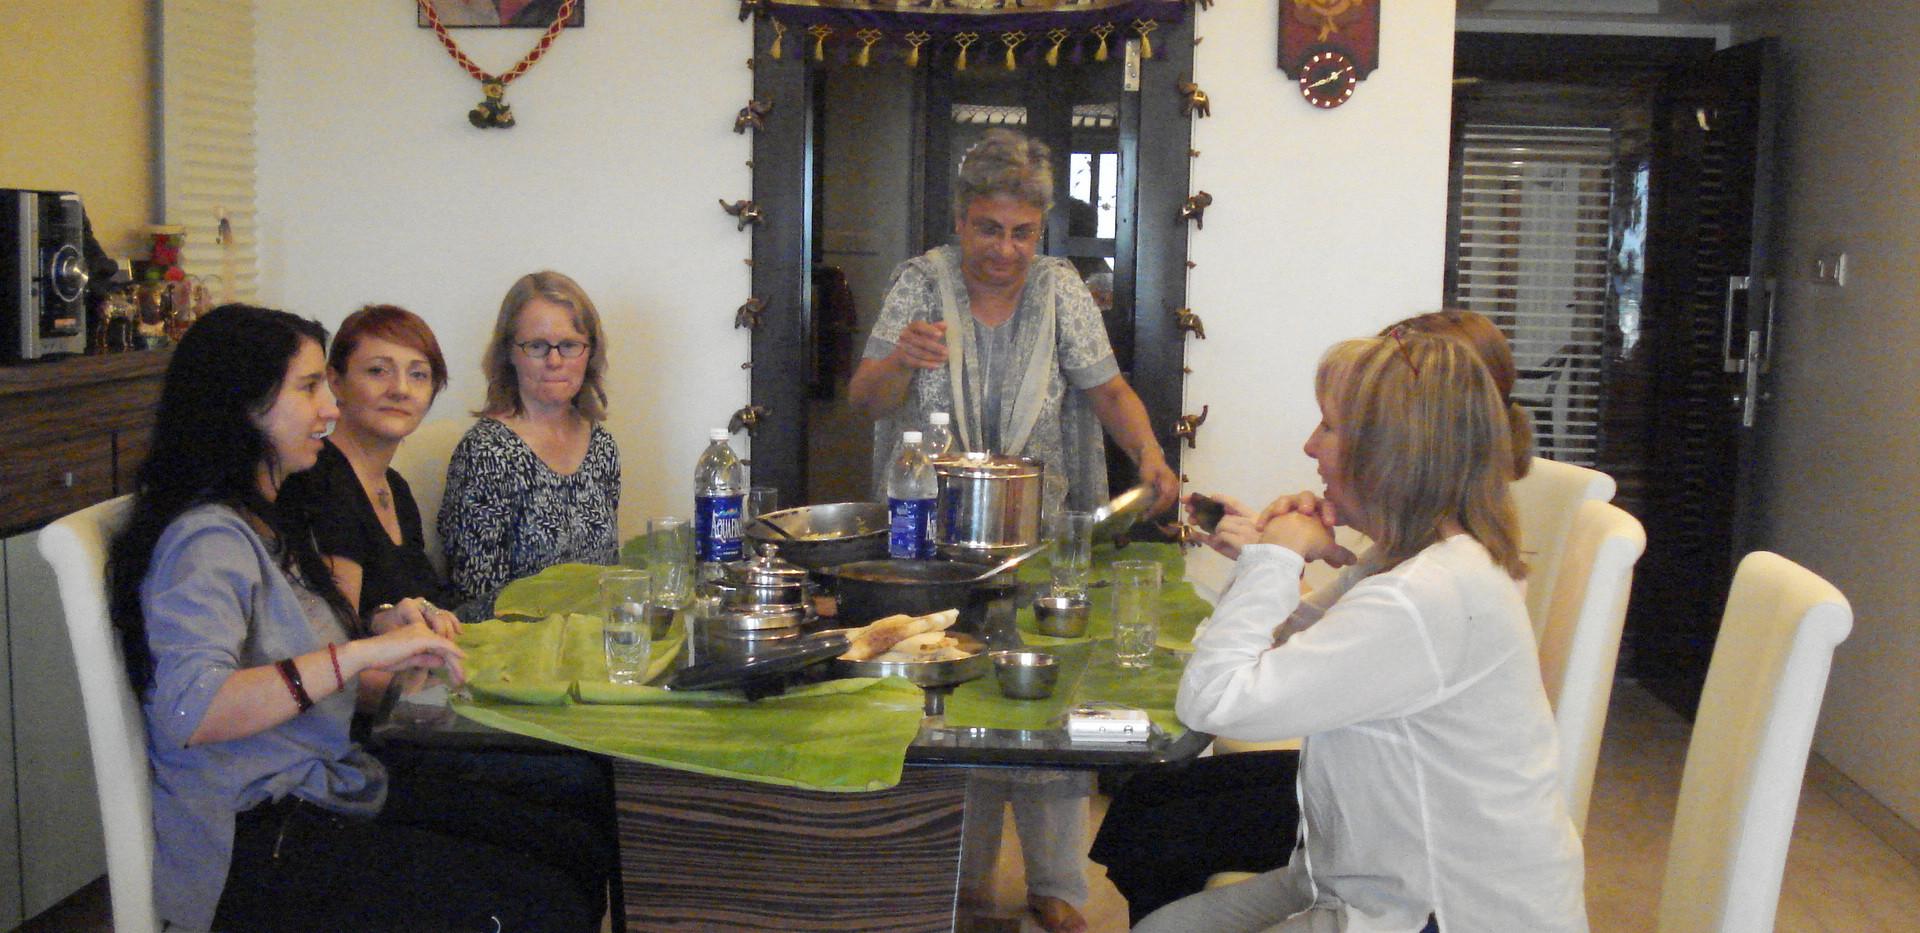 Left to Right: Melissa Major, Trina Davies, Beverley Cooper, Arundhati, Jornal Hall, Sally Stubbs